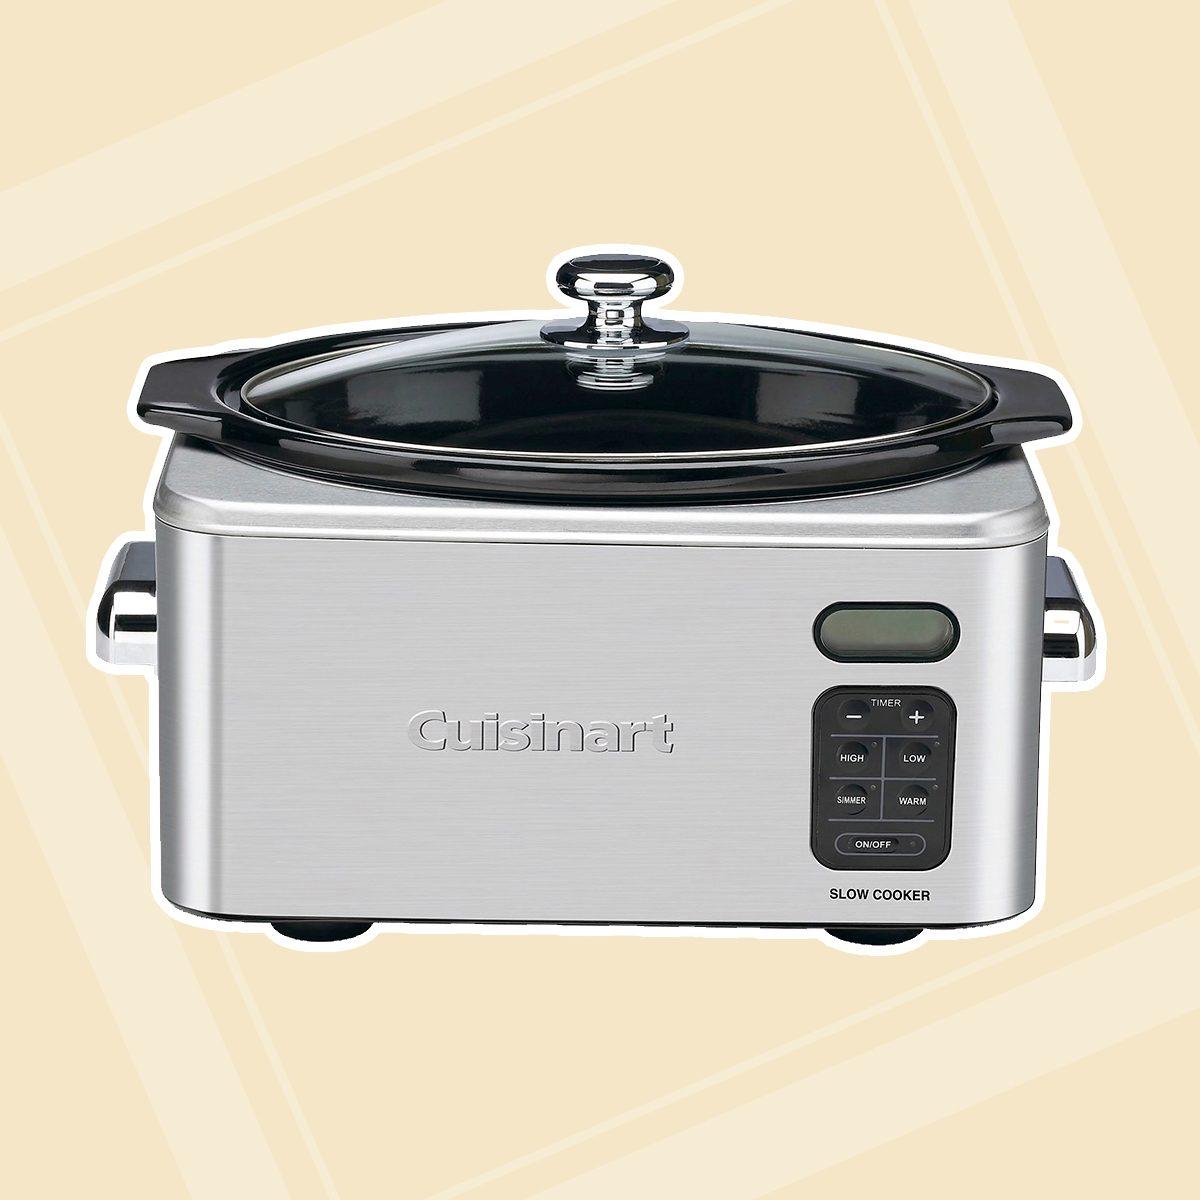 Cuisinart® 6.5 qt. Programmable Slow Cooker